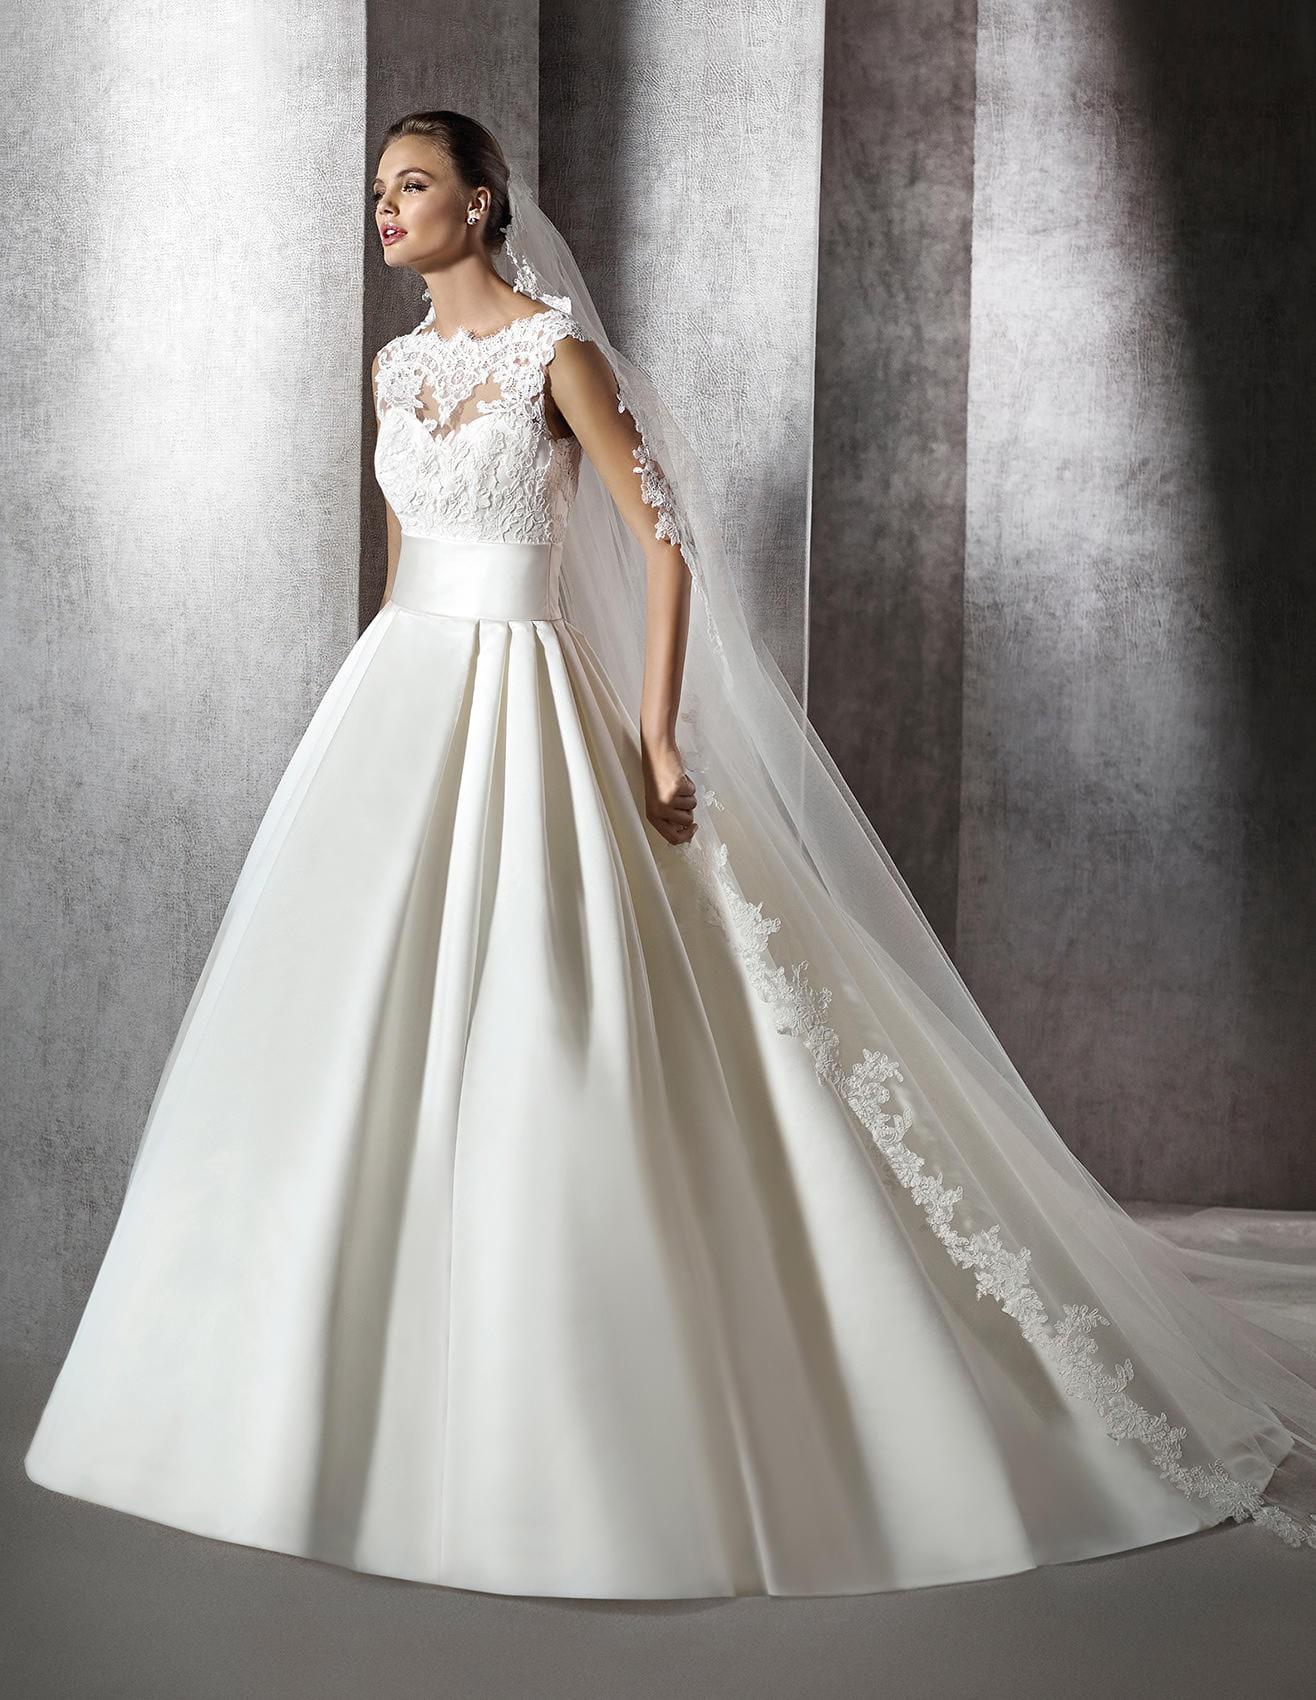 Wedding dress Zerelda St Patrick. Boutique Paris